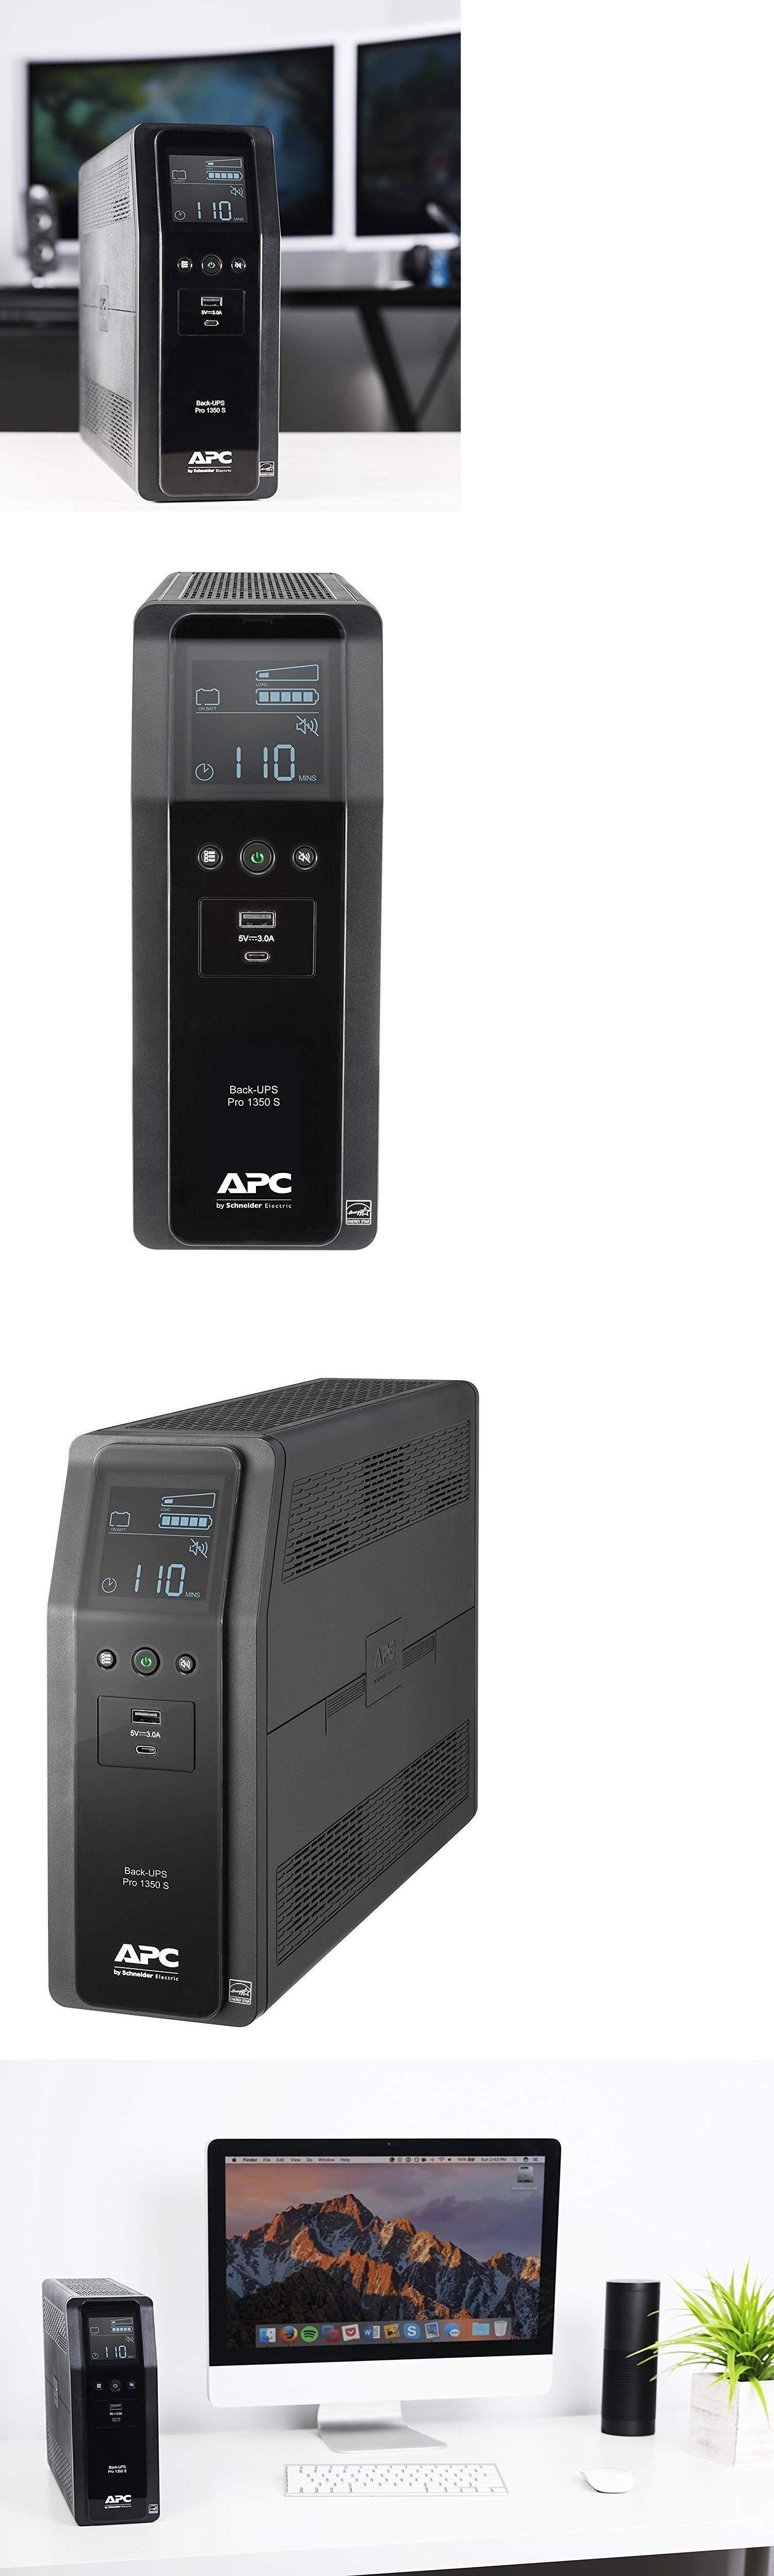 Uninterruptible Power Supplies 99265 Apc 1350va Back Ups Pro Sinewave Ups Battery Backup And Surge Protector Br1 Battery Backup Ups Batteries Surge Protector